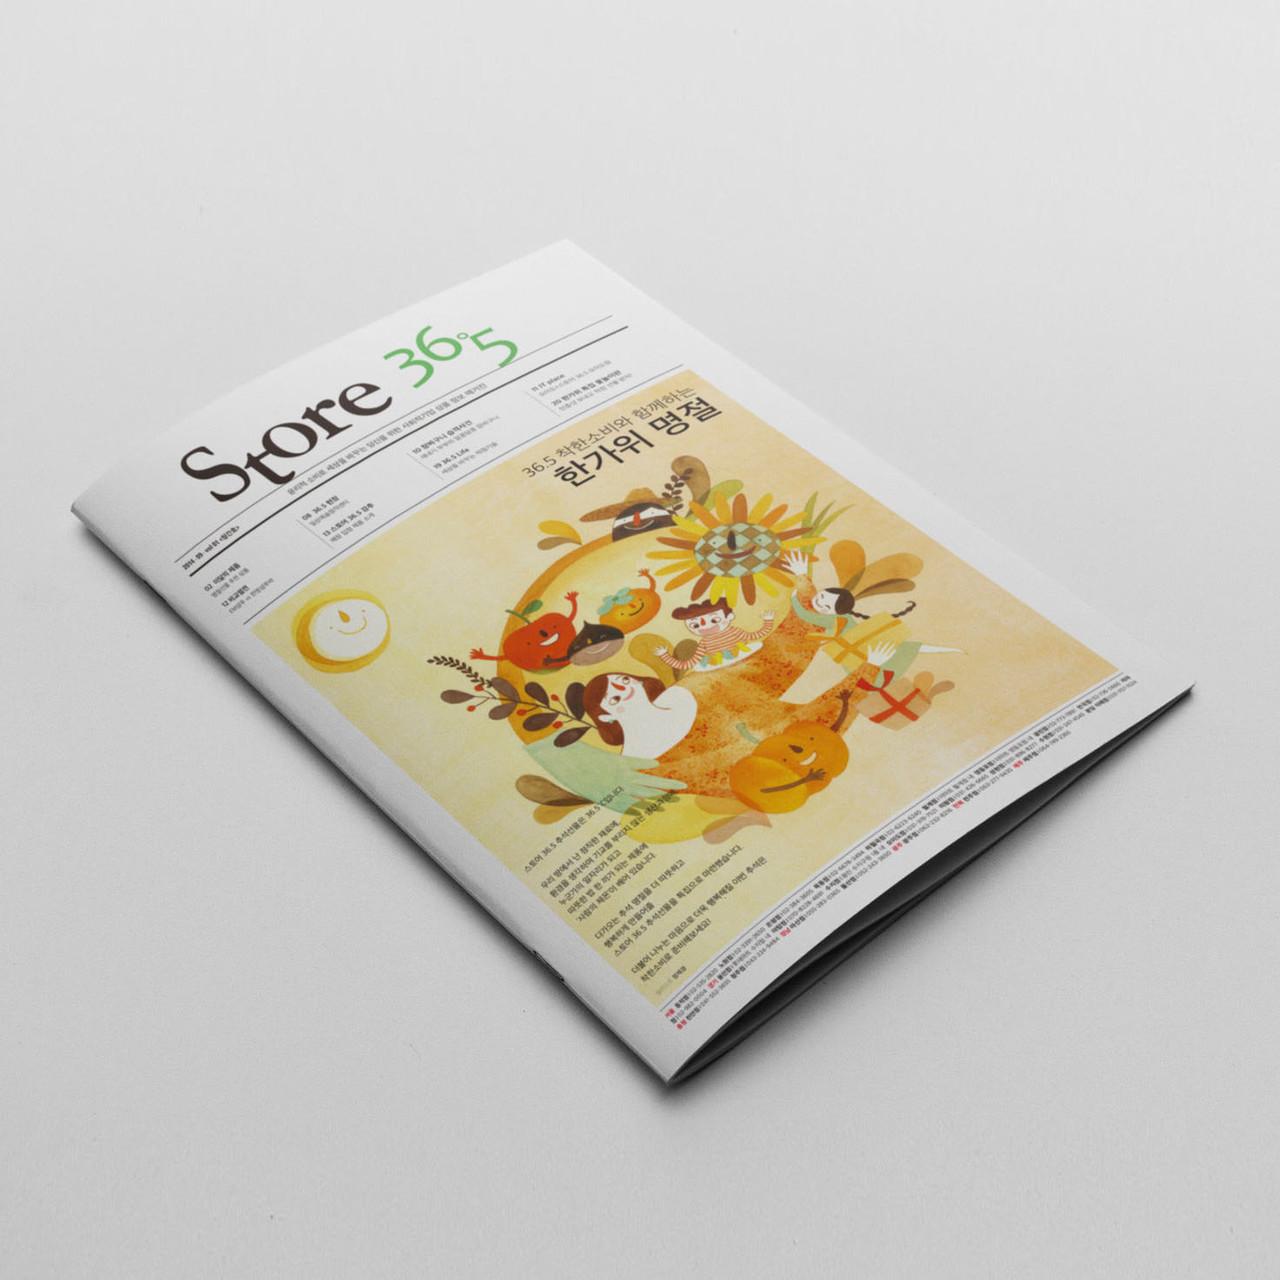 Store 36.5 정기간행물 디자인 시안 - Store 36.5